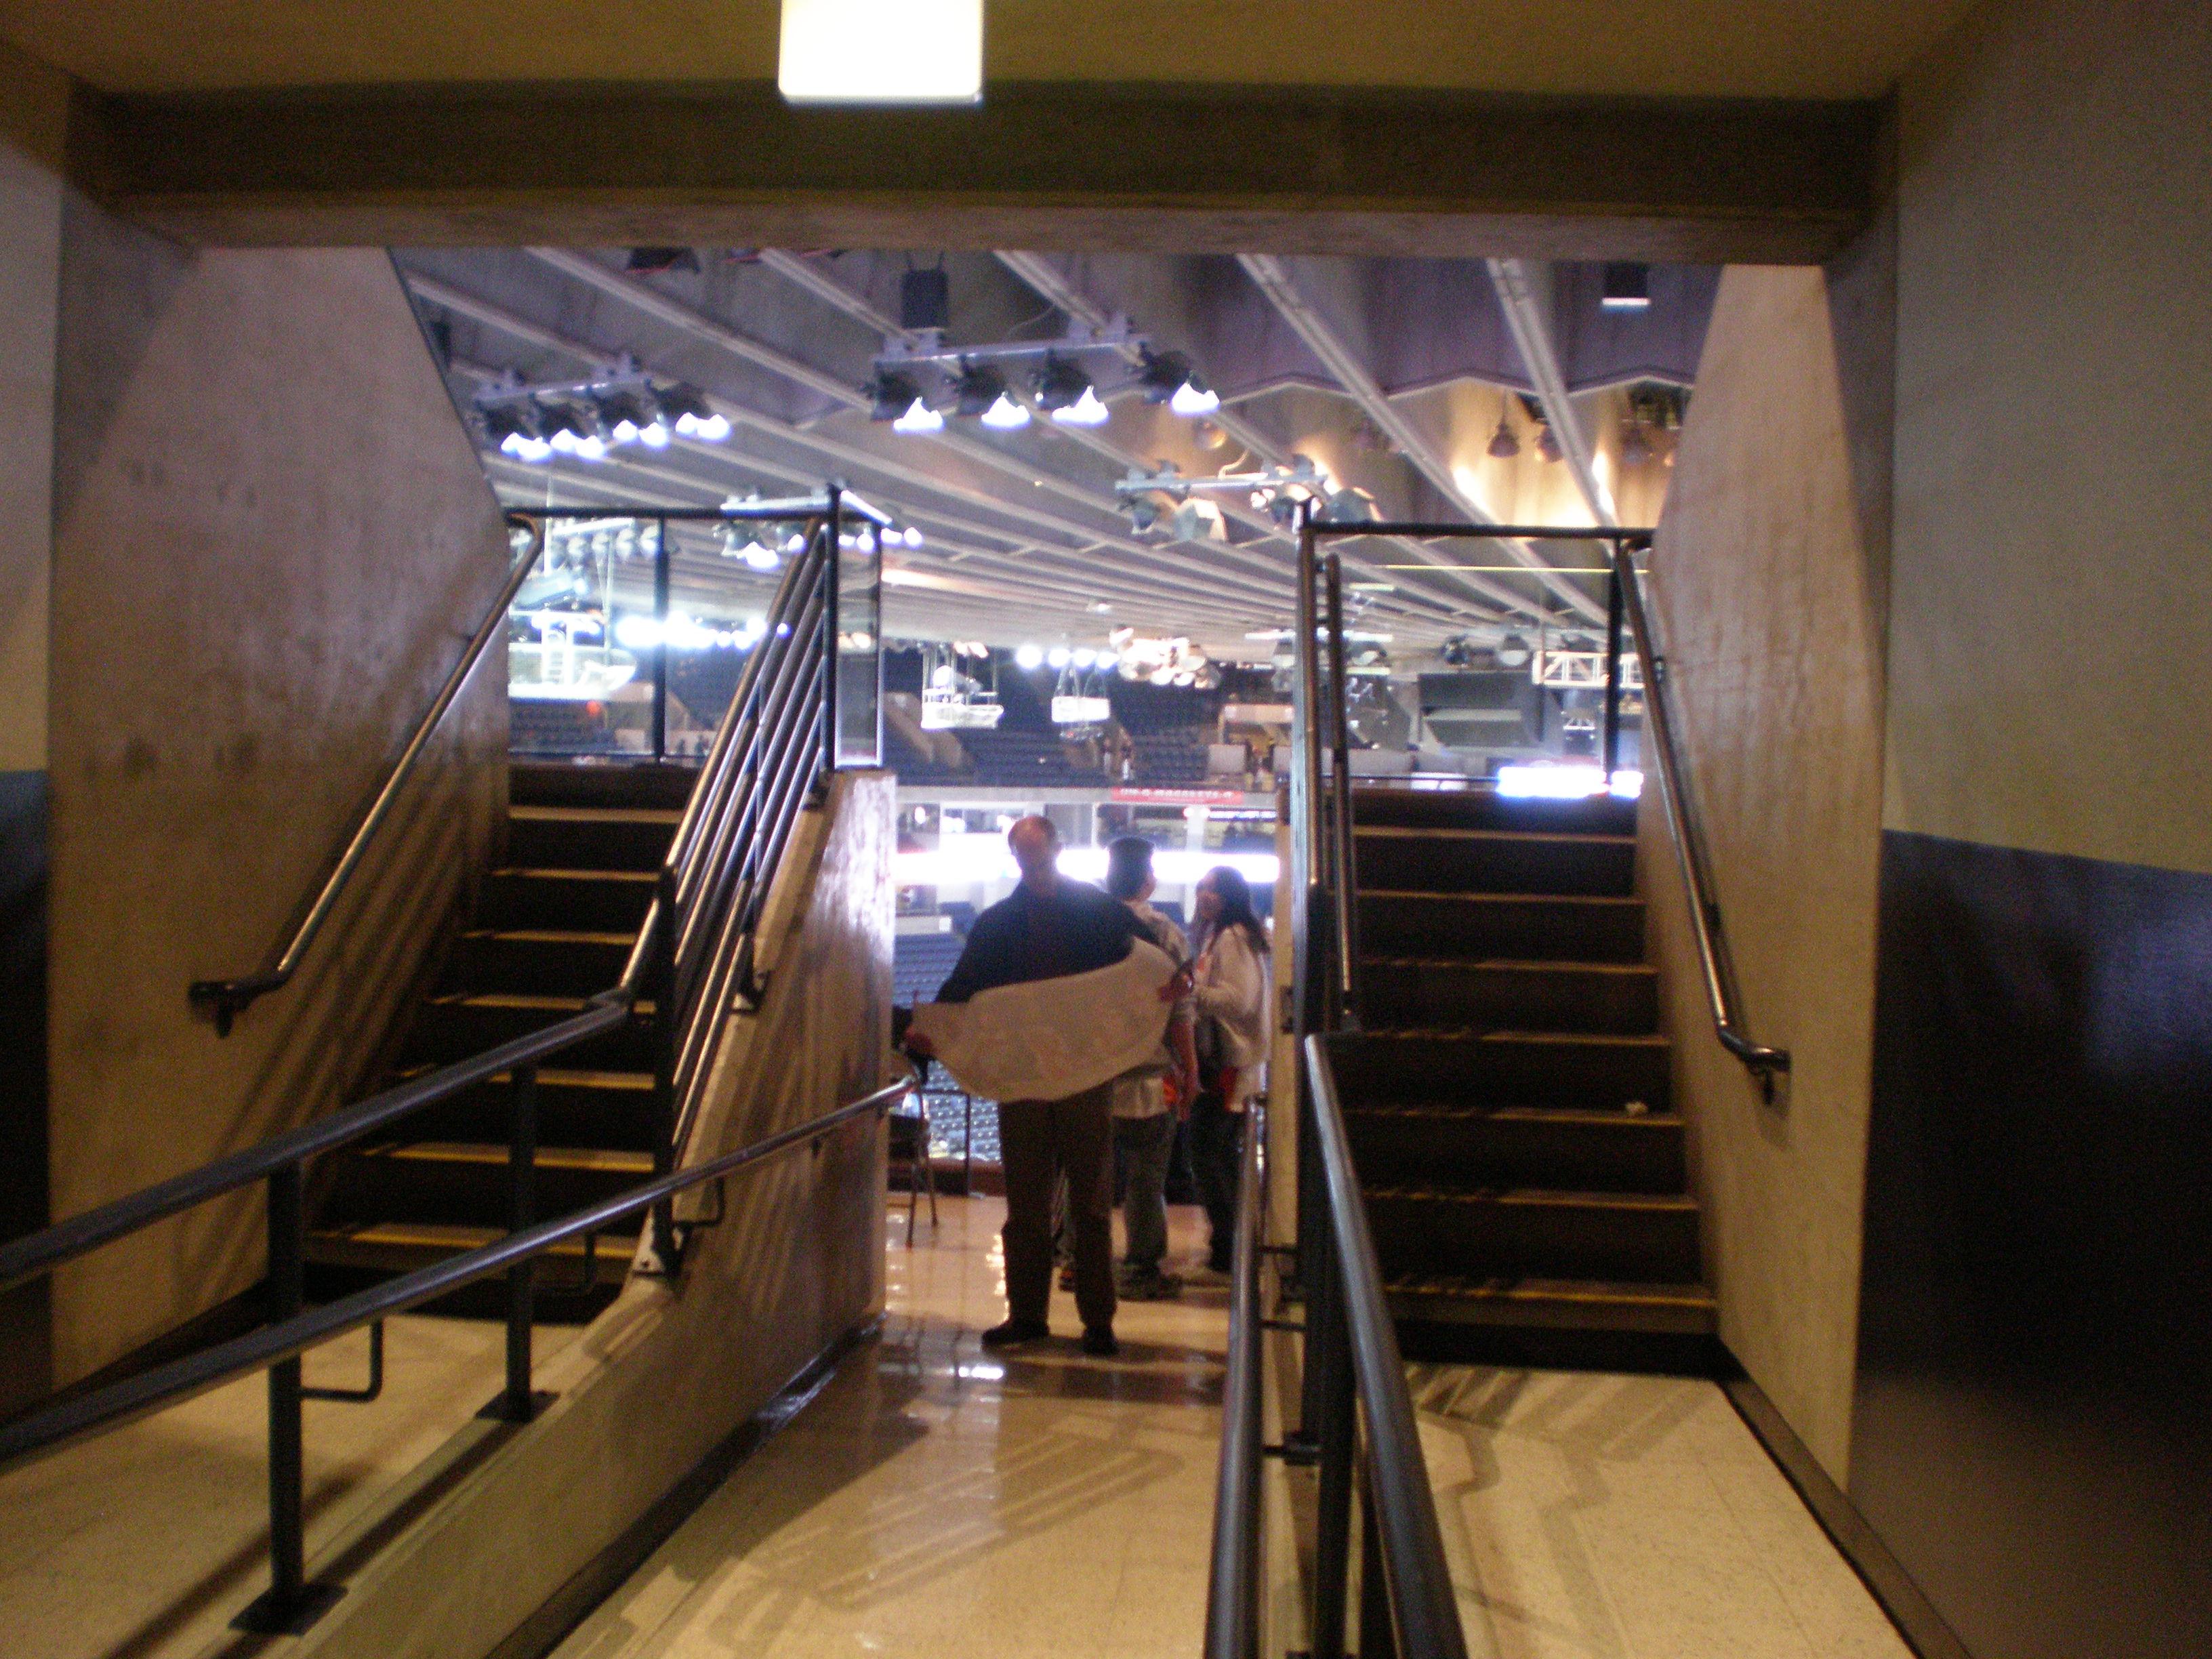 File:Oracle Arena 2nd Floor Entrance To Bleachers 1.JPG